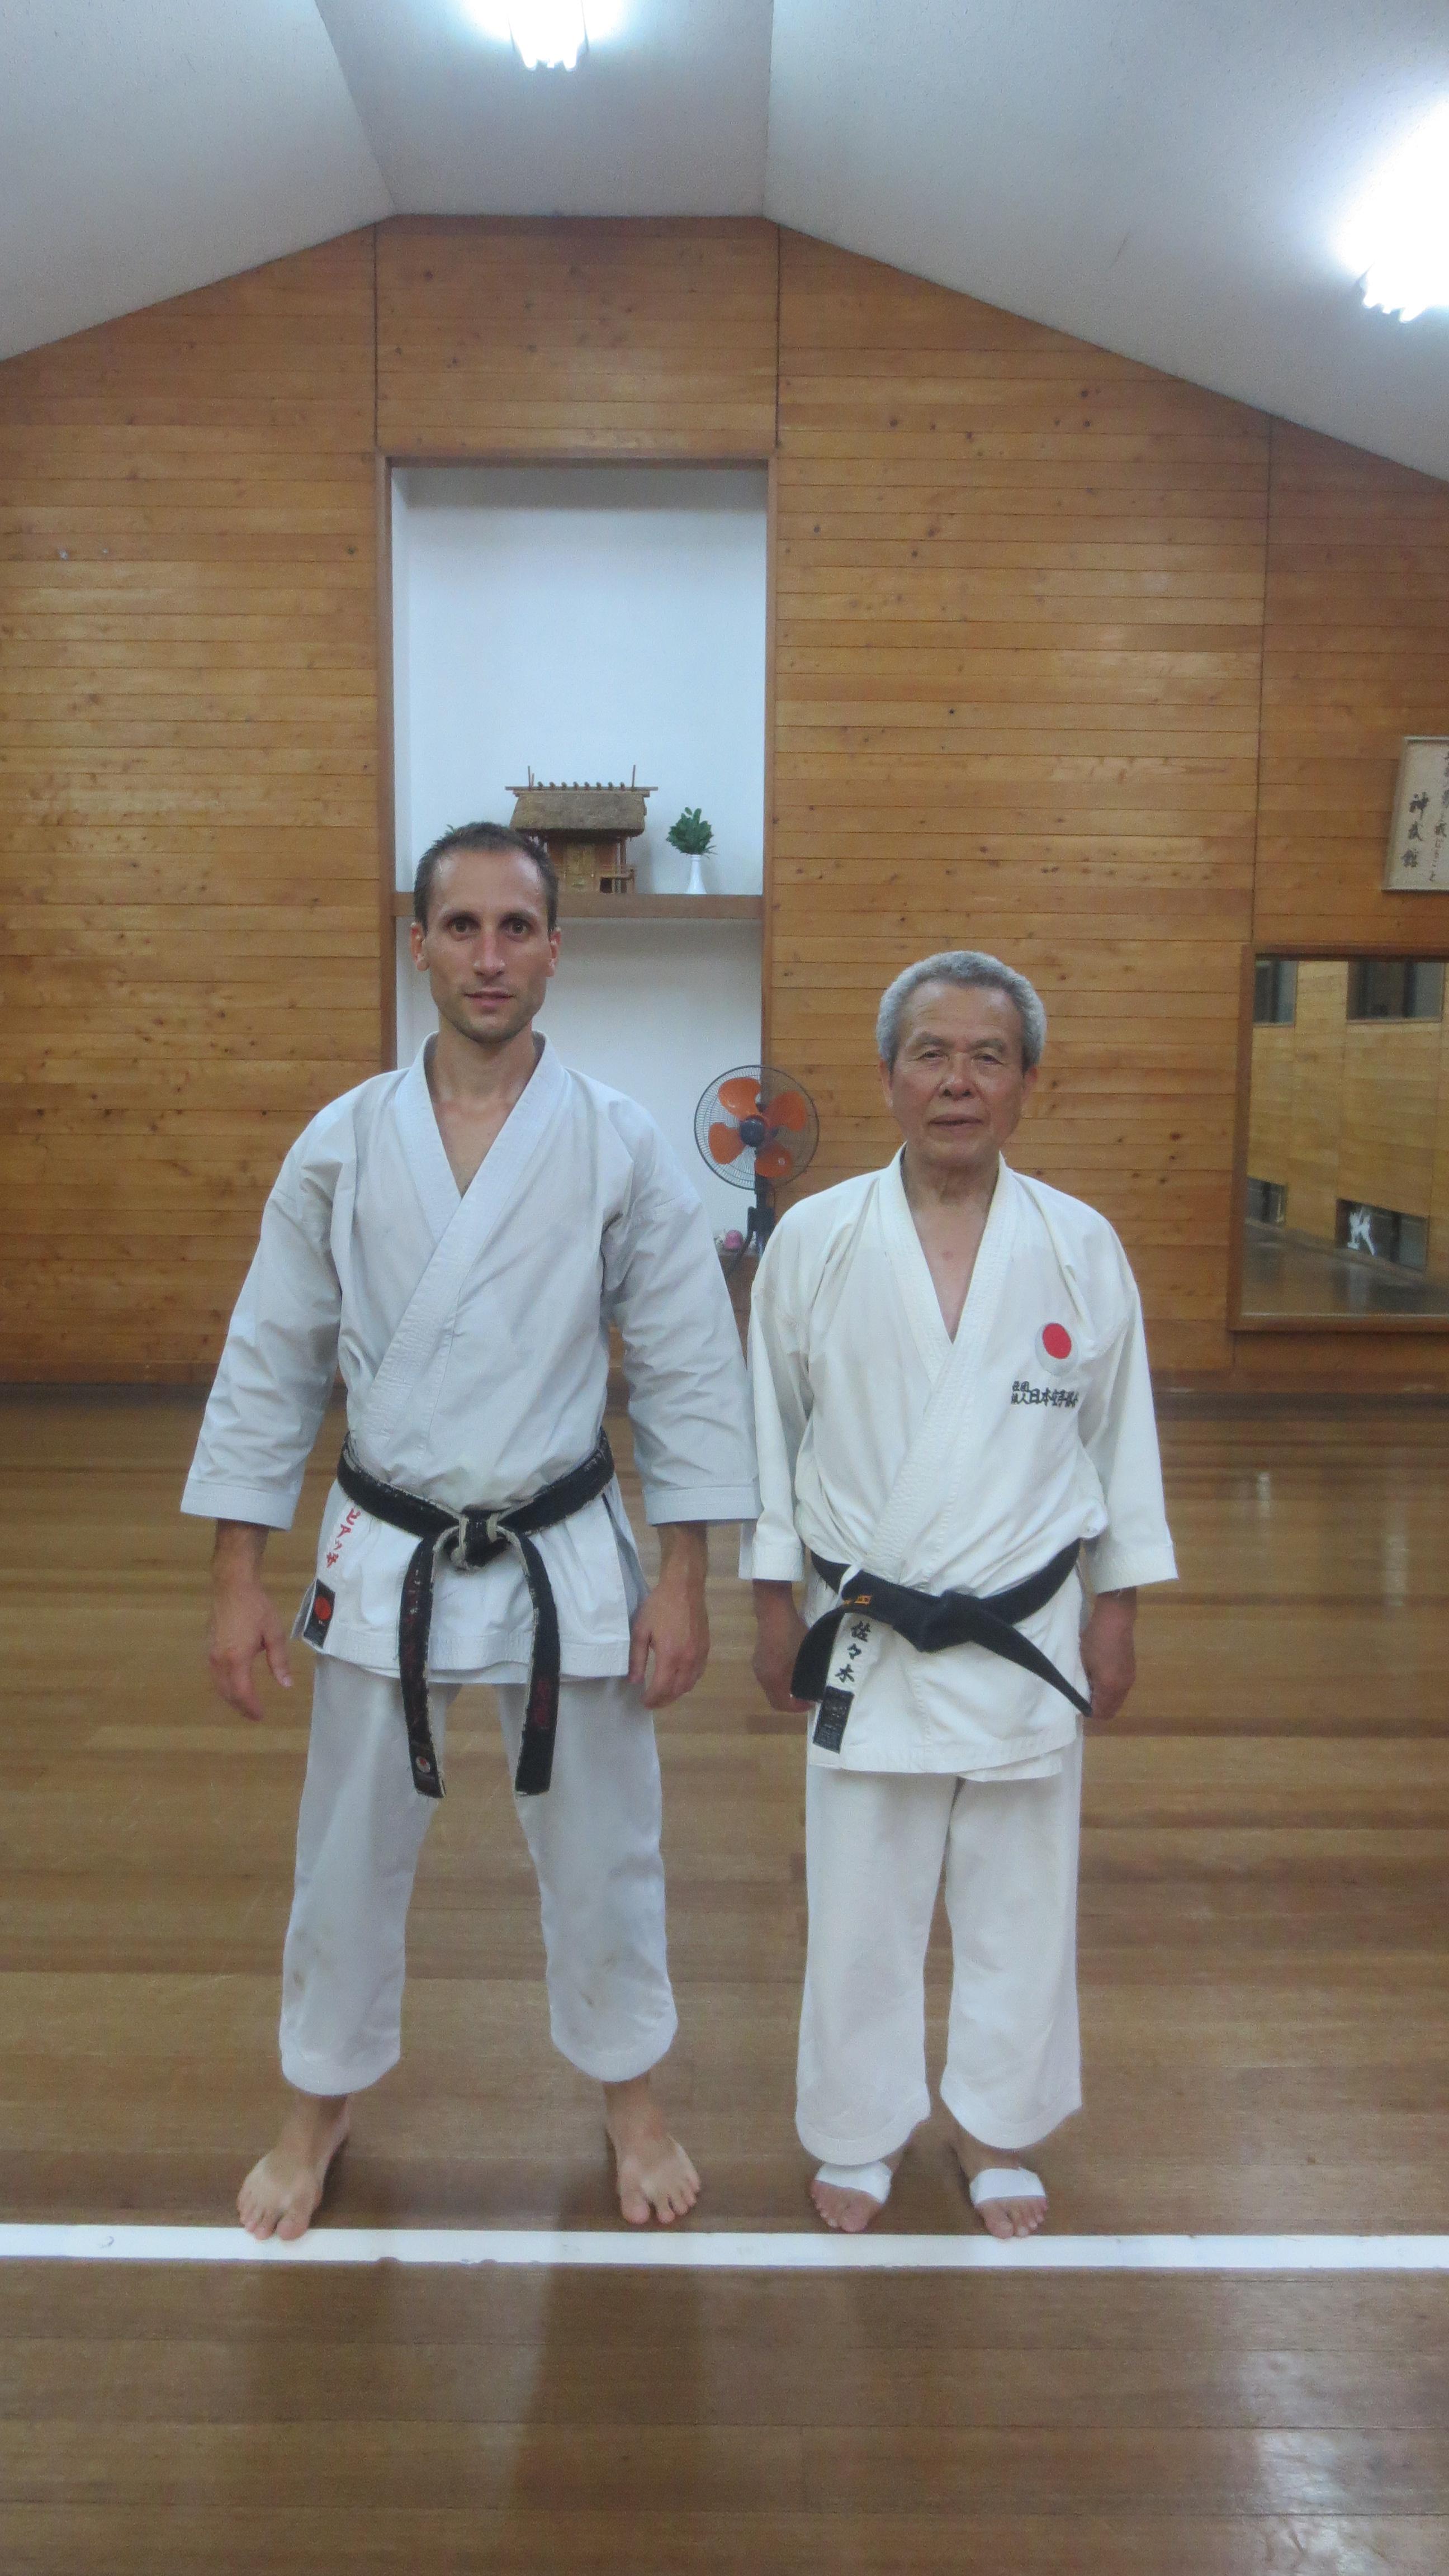 Steve Piazza Japon 2015 jka karate